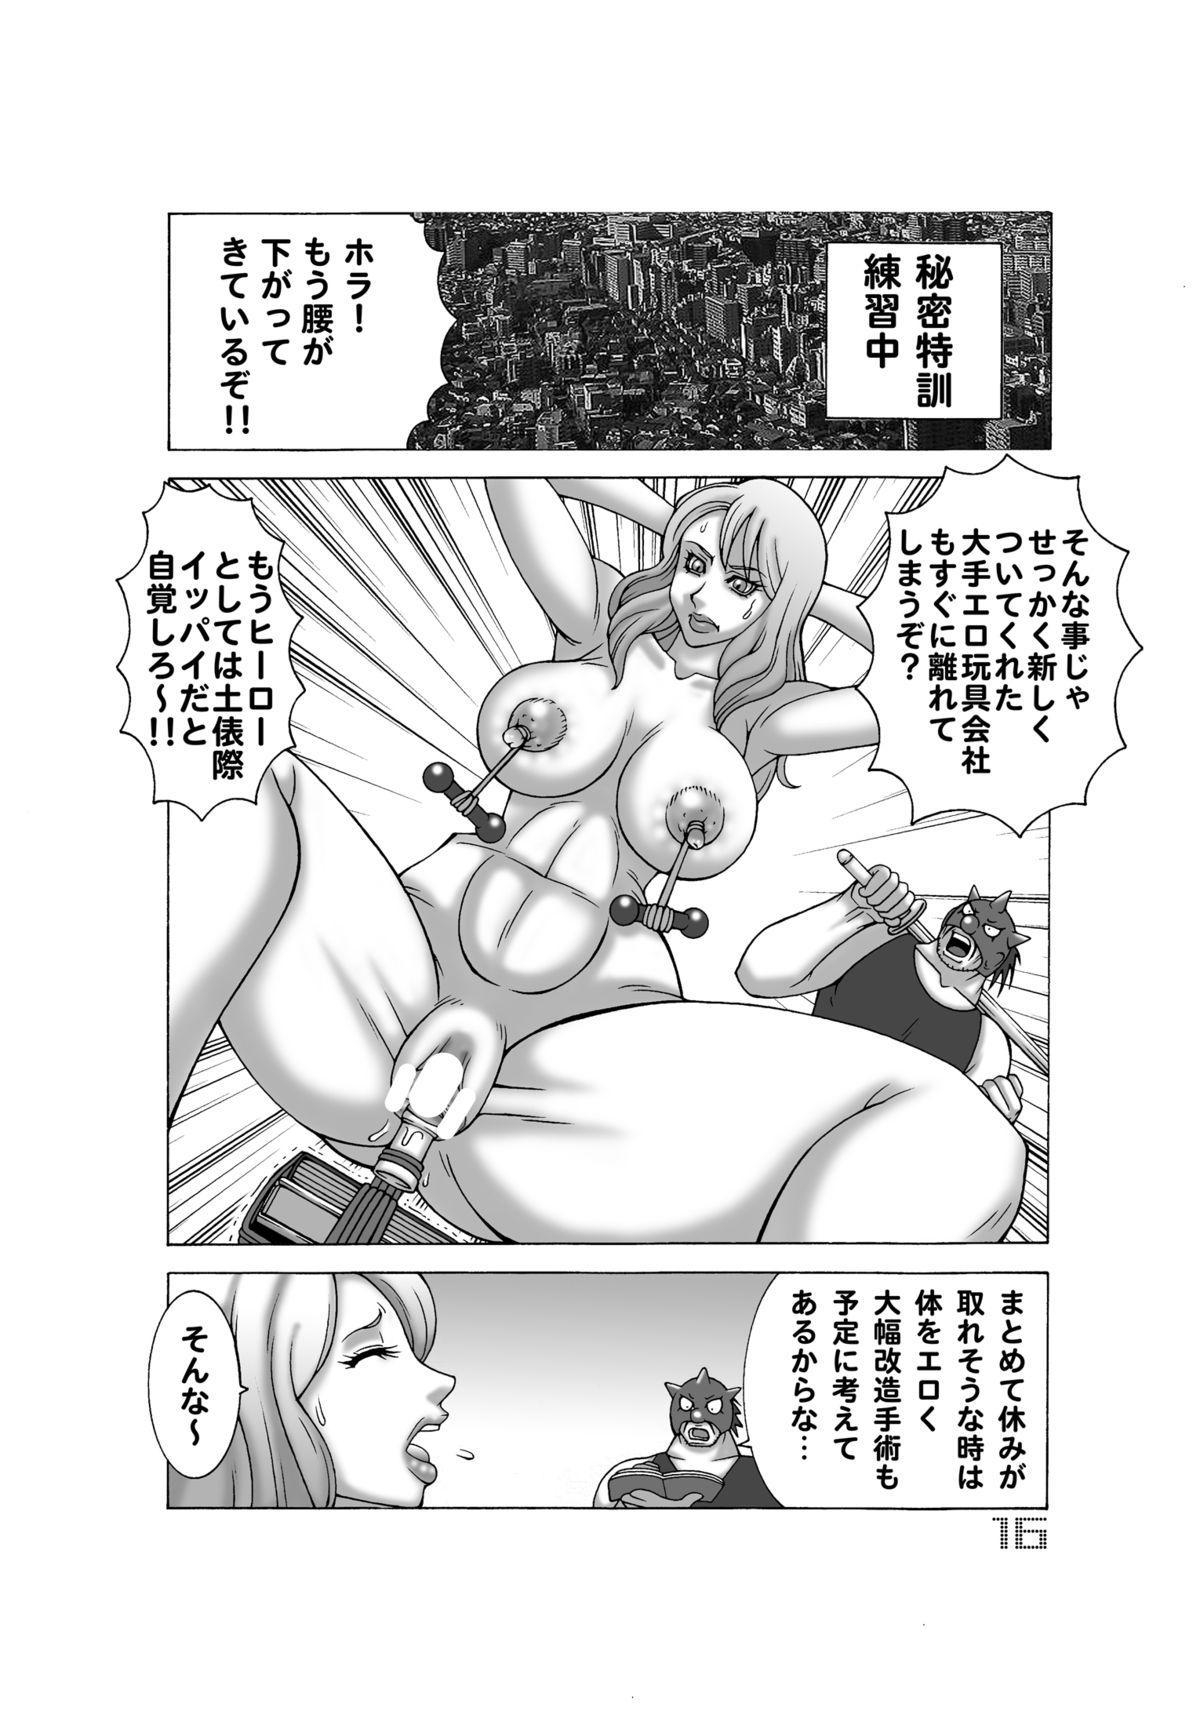 Tiger & Bunny Dynamite 15